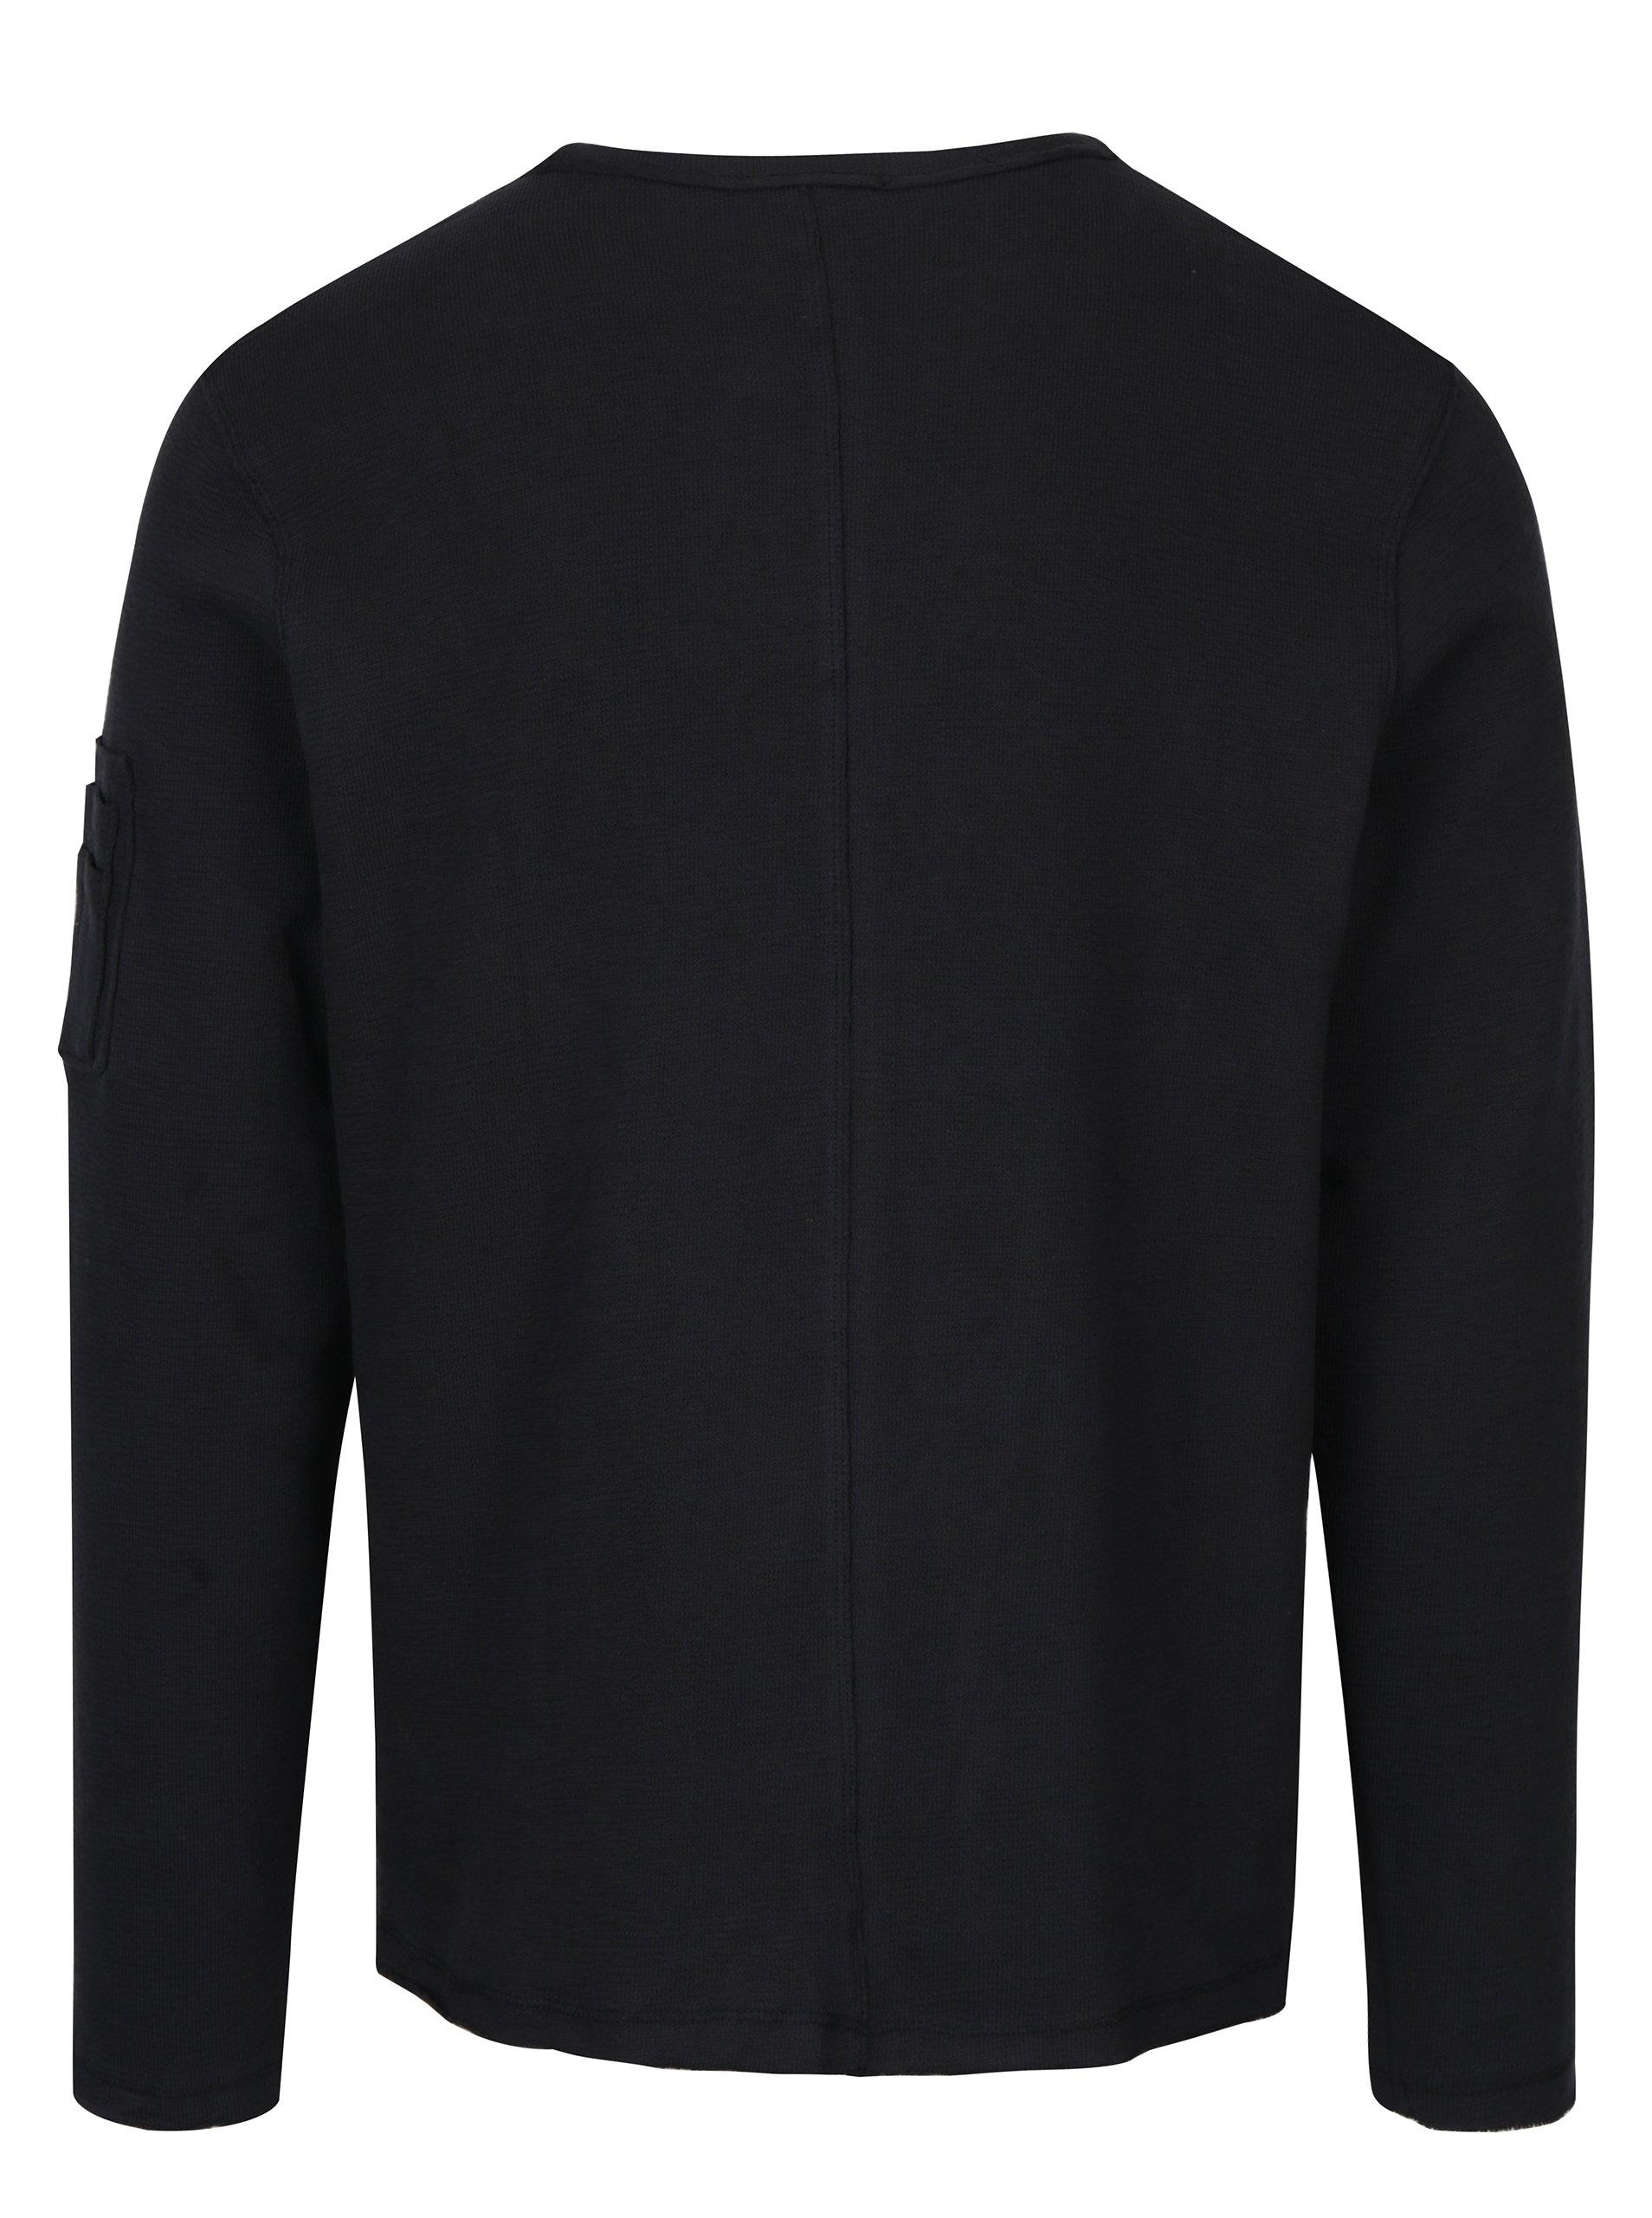 Černé triko s dlouhým rukávem Selected Homme Daniel